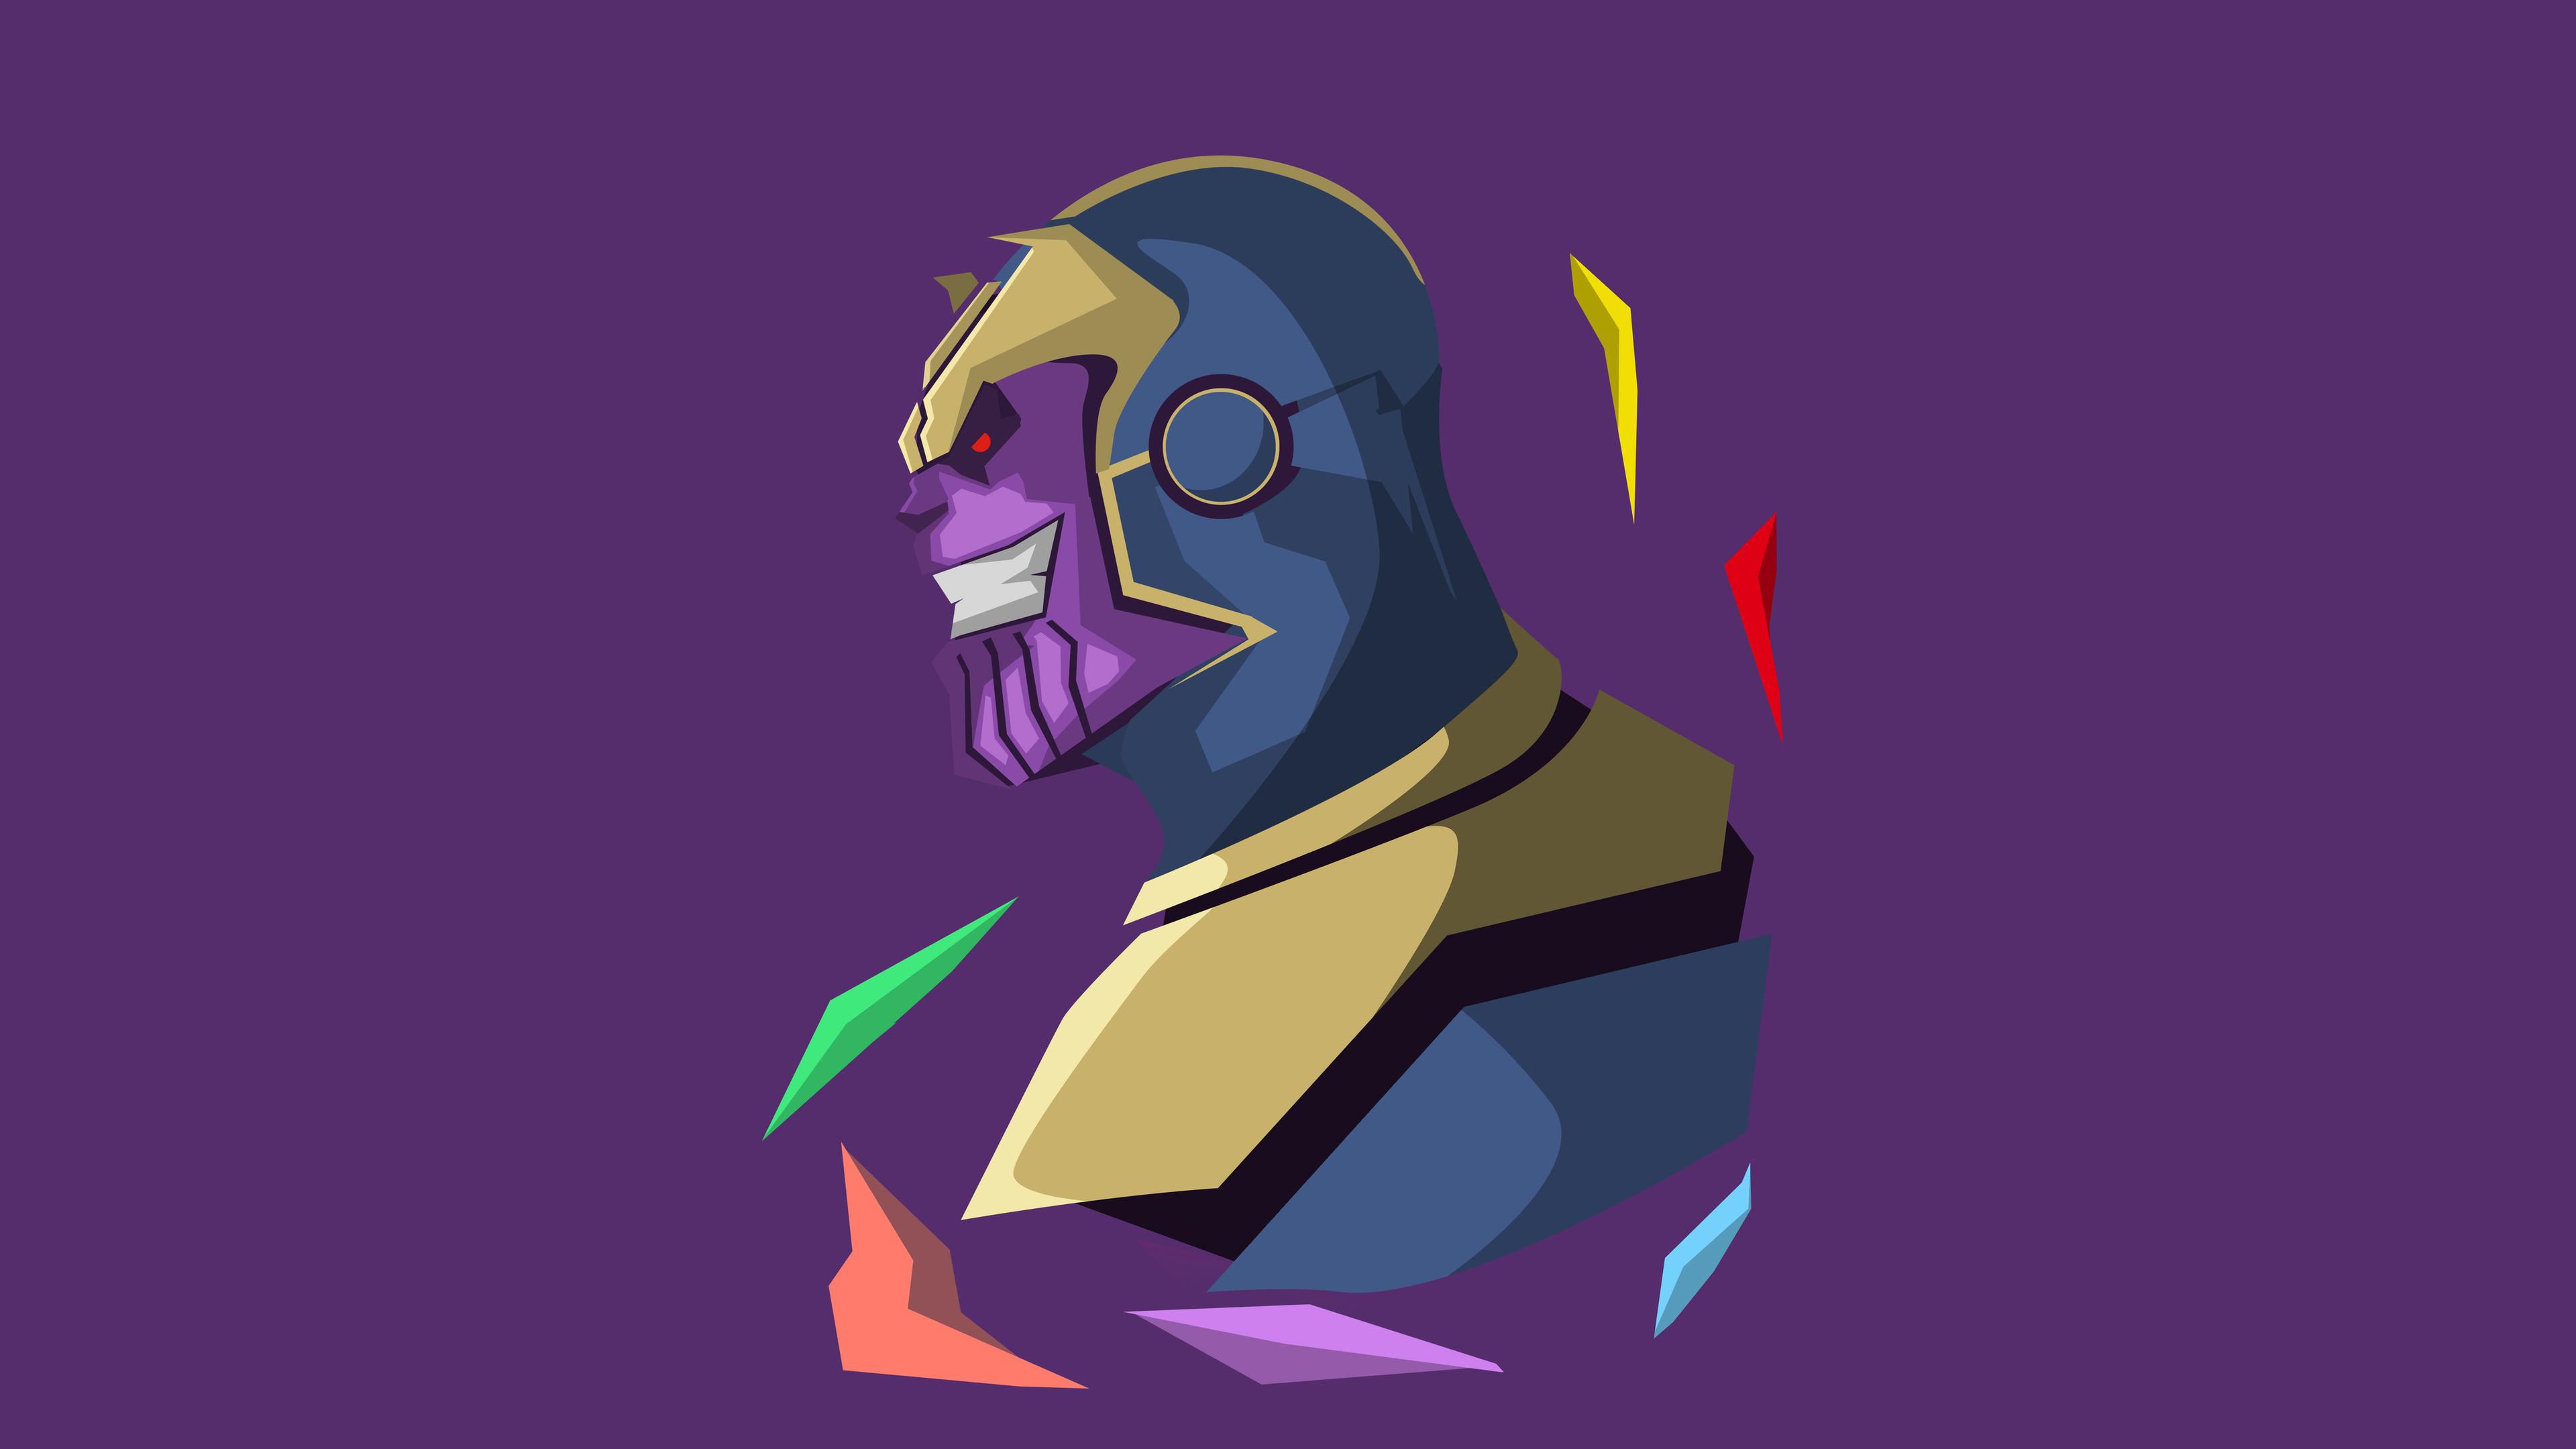 thanos 5k minimalistic 1536523889 - Thanos 5k Minimalistic - thanos-wallpapers, superheroes wallpapers, minimalist wallpapers, minimalism wallpapers, hd-wallpapers, 5k wallpapers, 4k-wallpapers